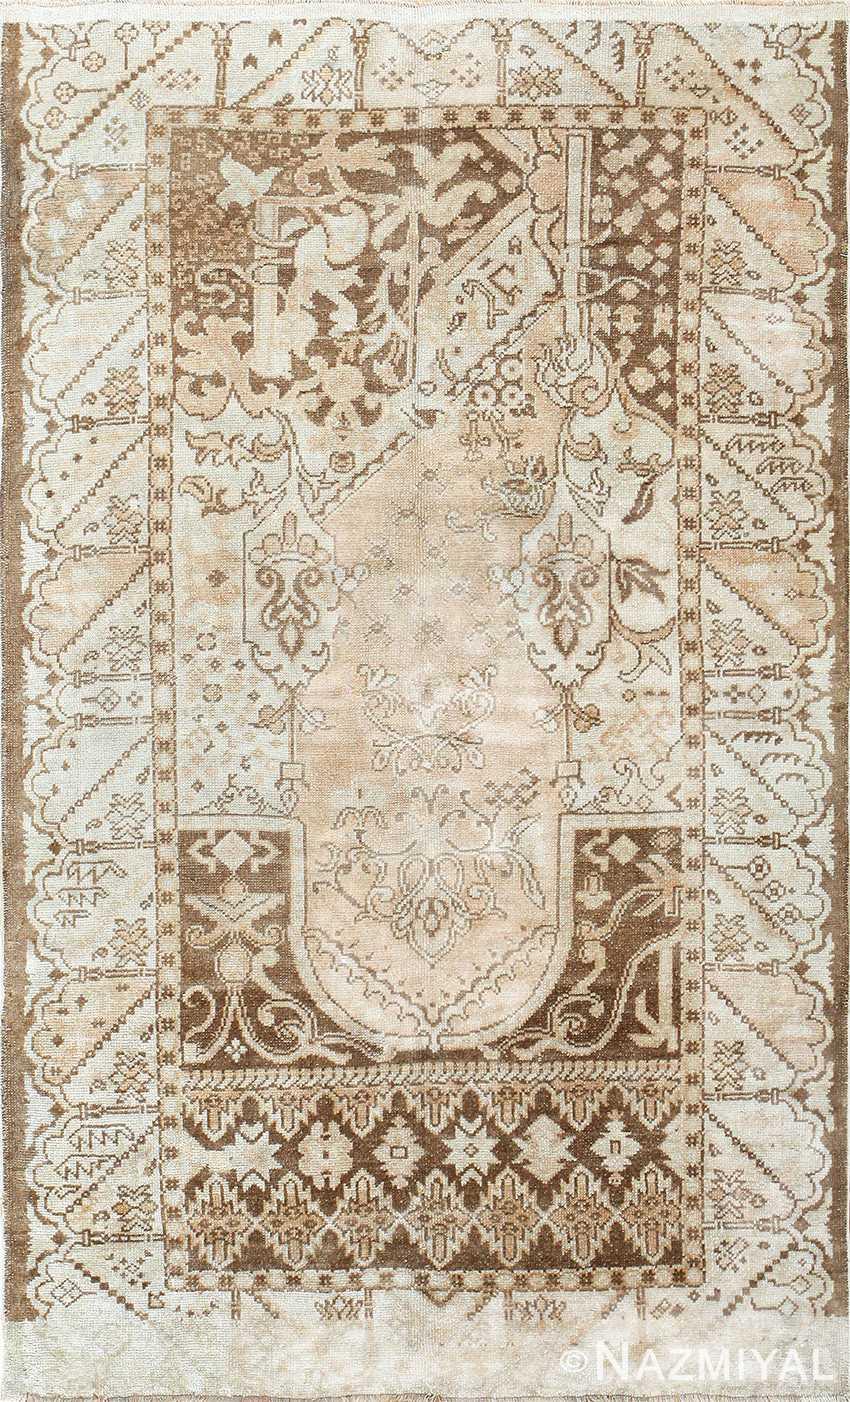 Geometric Antique Turkish Ghiordes Rug 50290 Nazmiyal